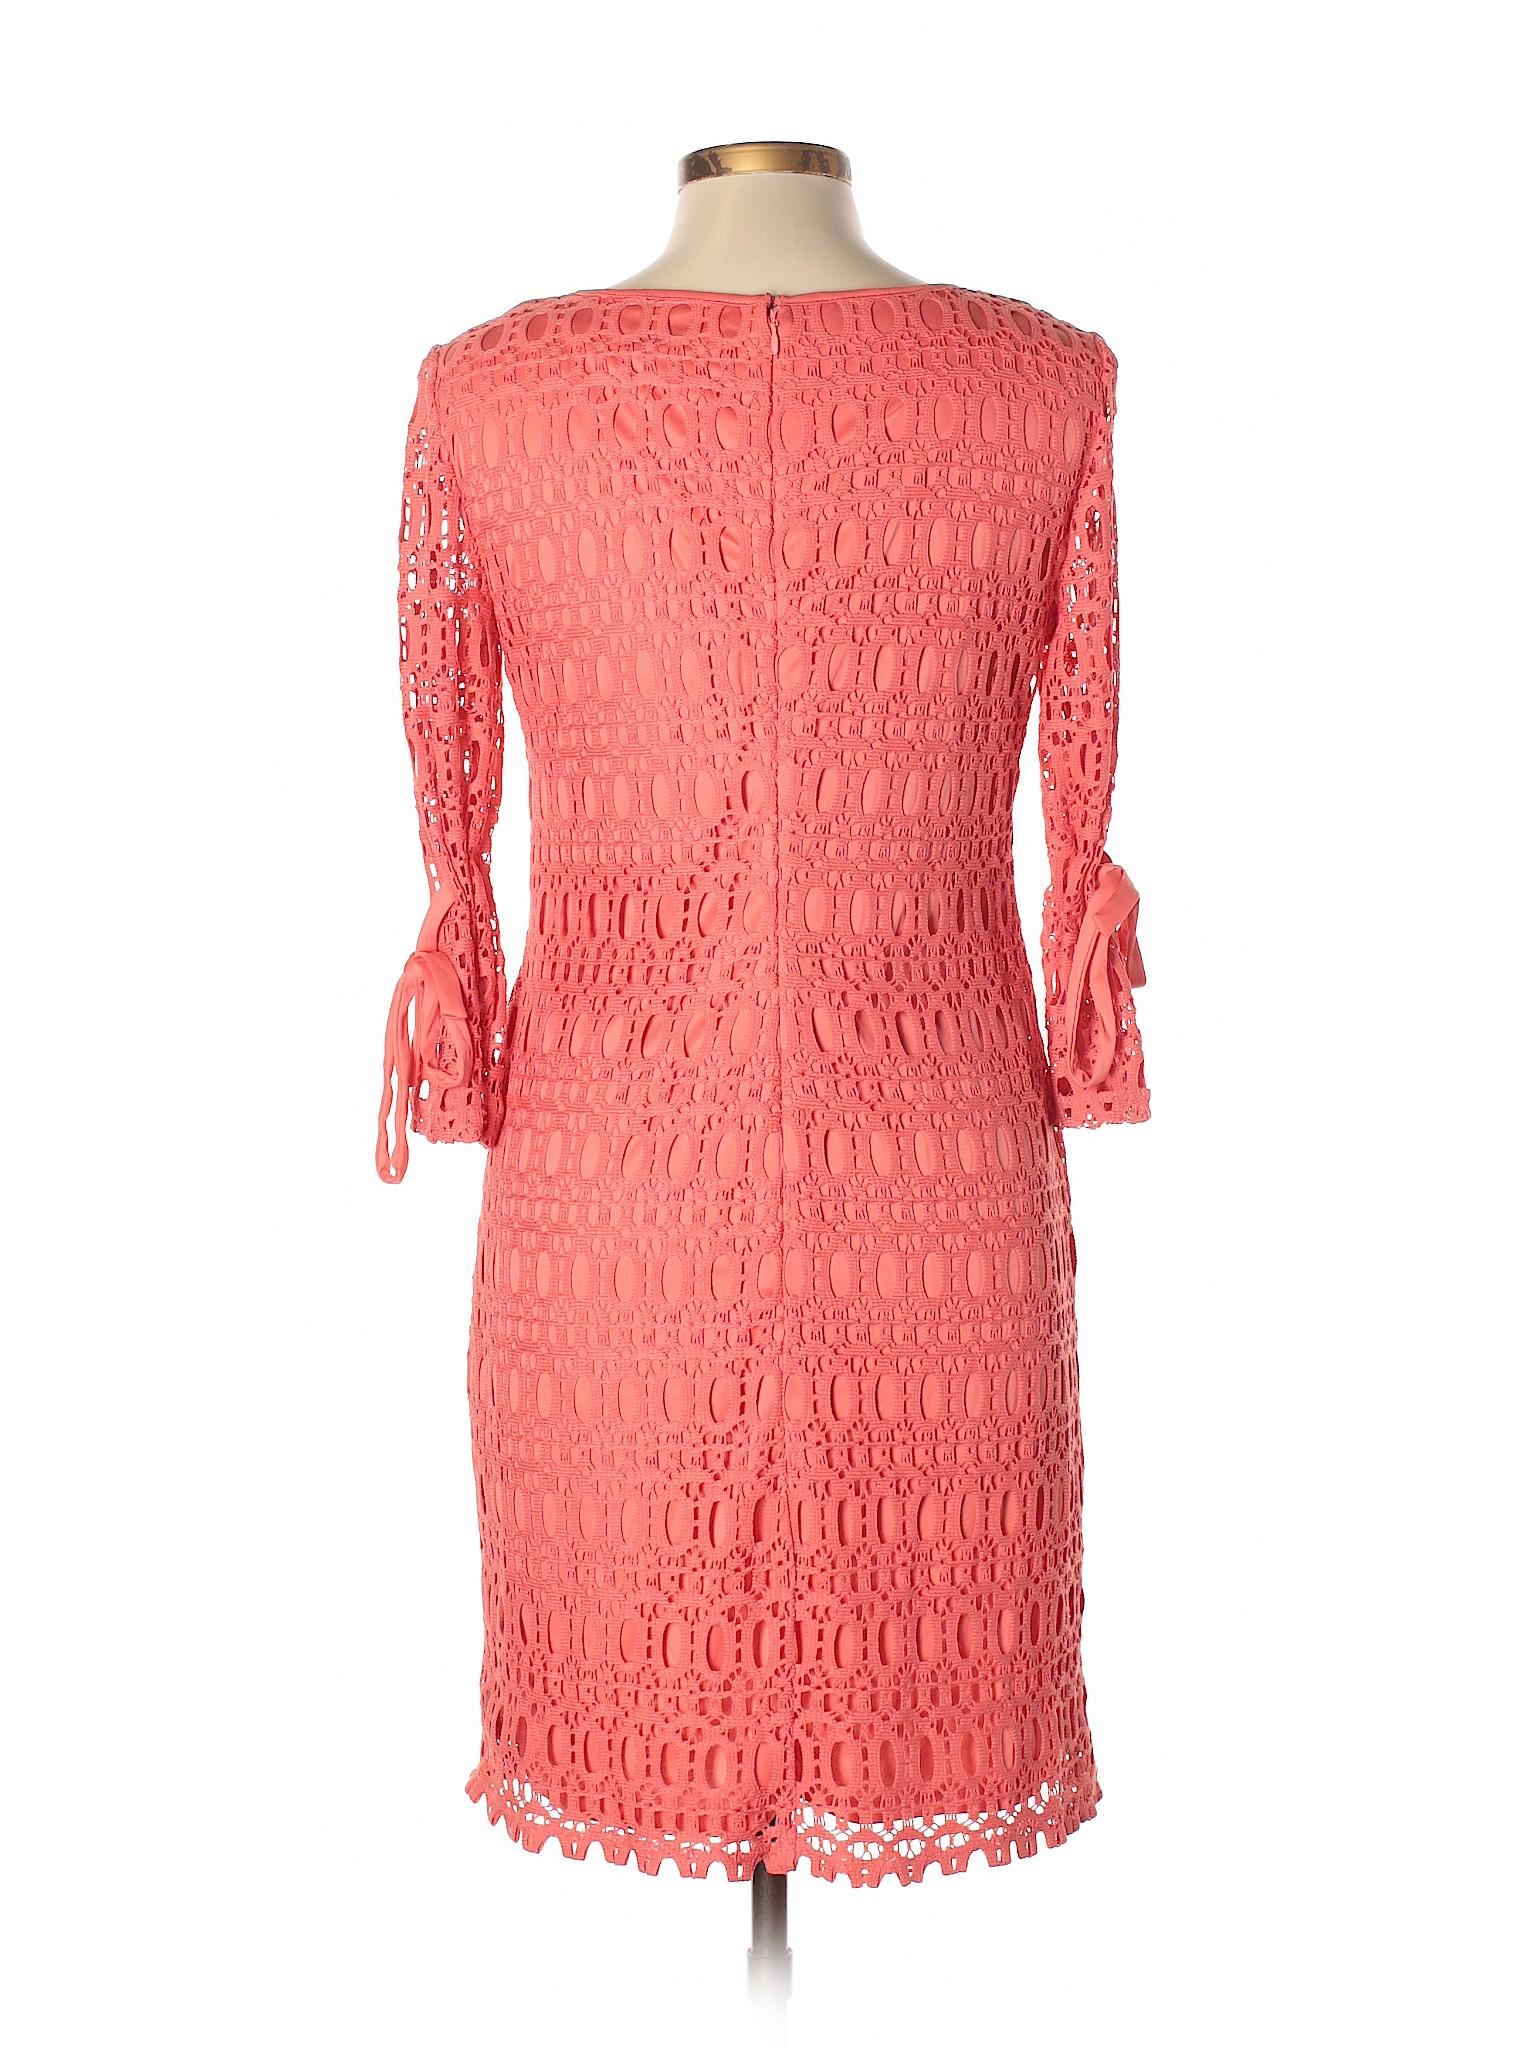 winter amp;K Boutique Dress Casual R 1qPwAxdE